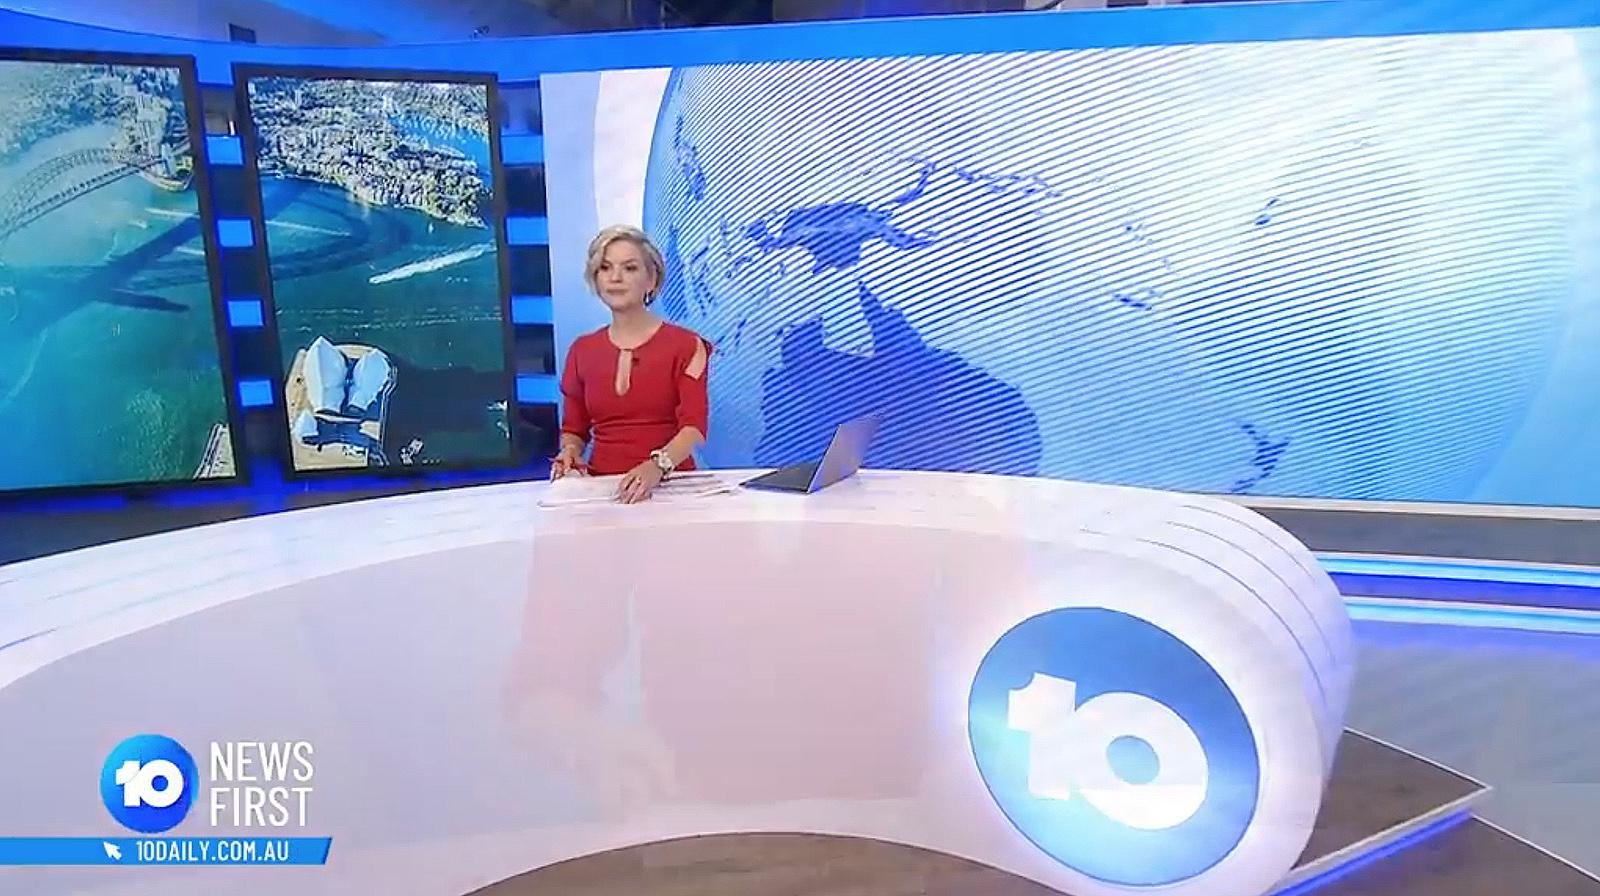 NCS_Network-10-Sydney-10-News-First-studio_026